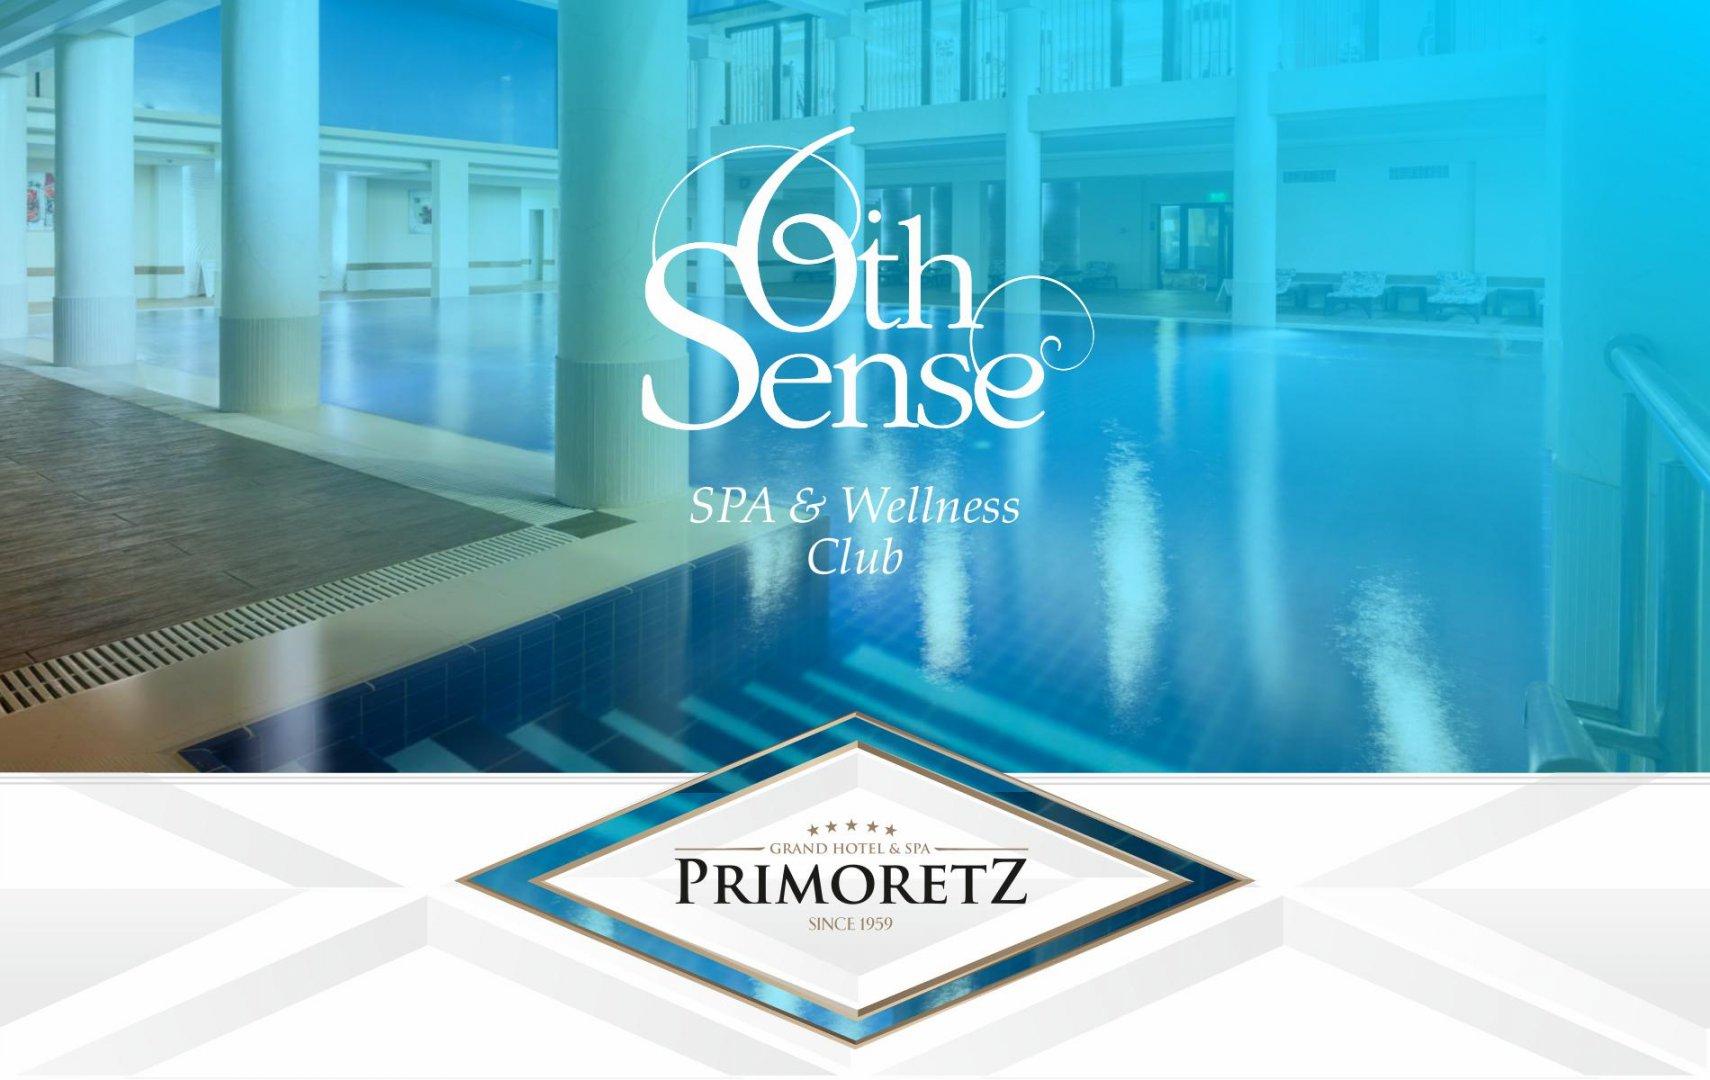 6th Sense е разположен на 3000 кв.м.